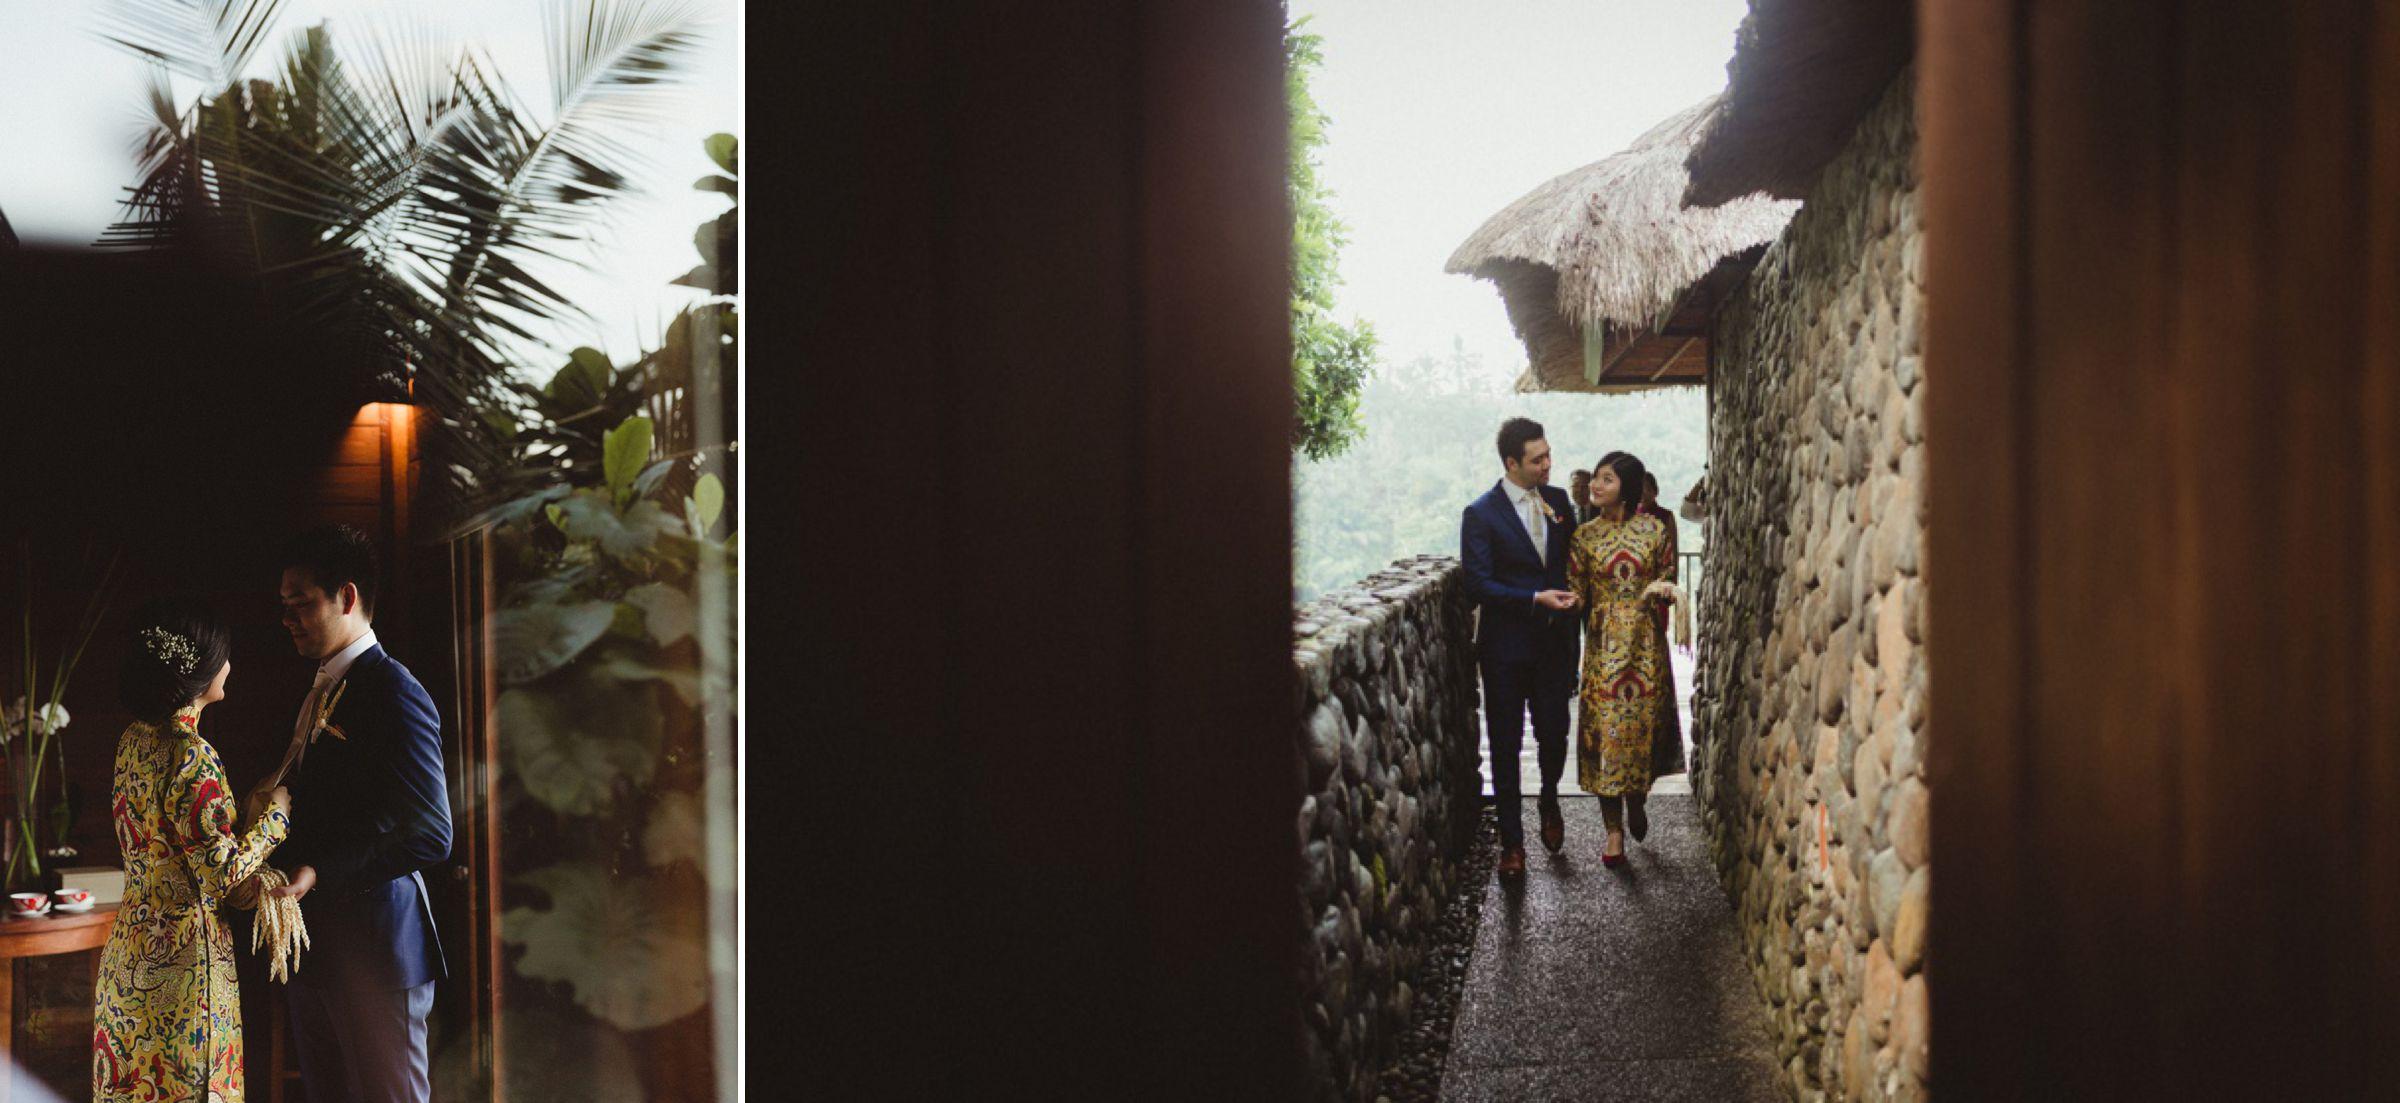 Tim-Danika-Bali-Wedding-Pyara-Photo-Evans 18.jpg